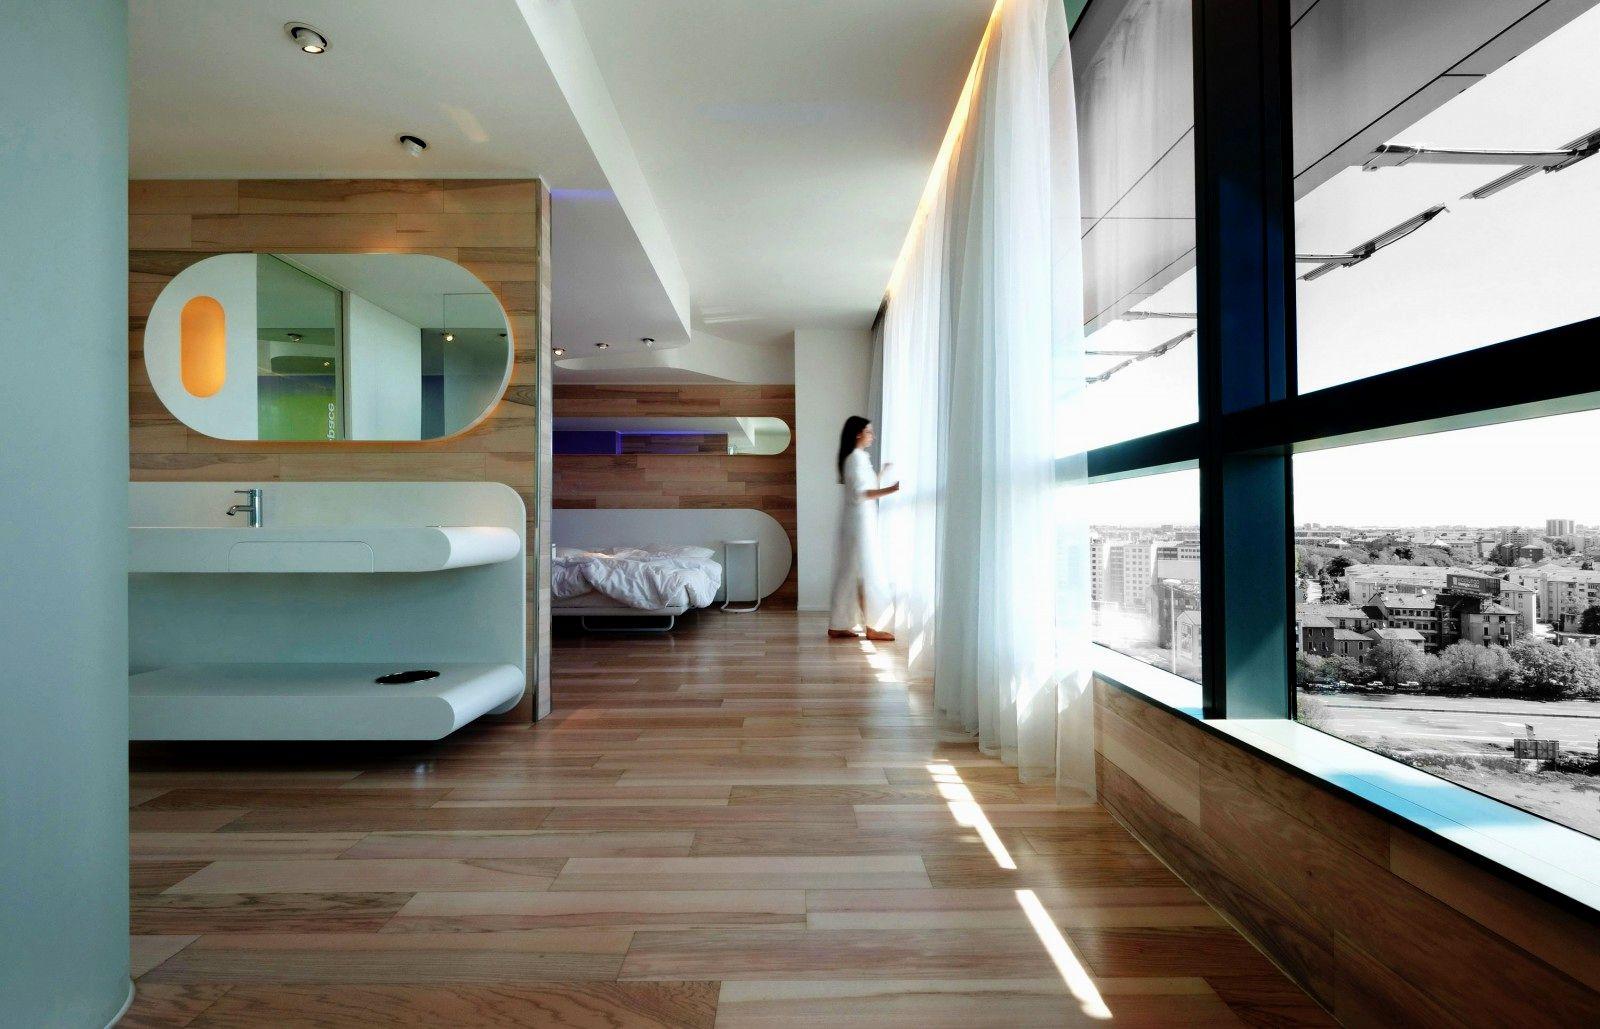 excellent bathroom decor sets concept-Incredible Bathroom Decor Sets Design